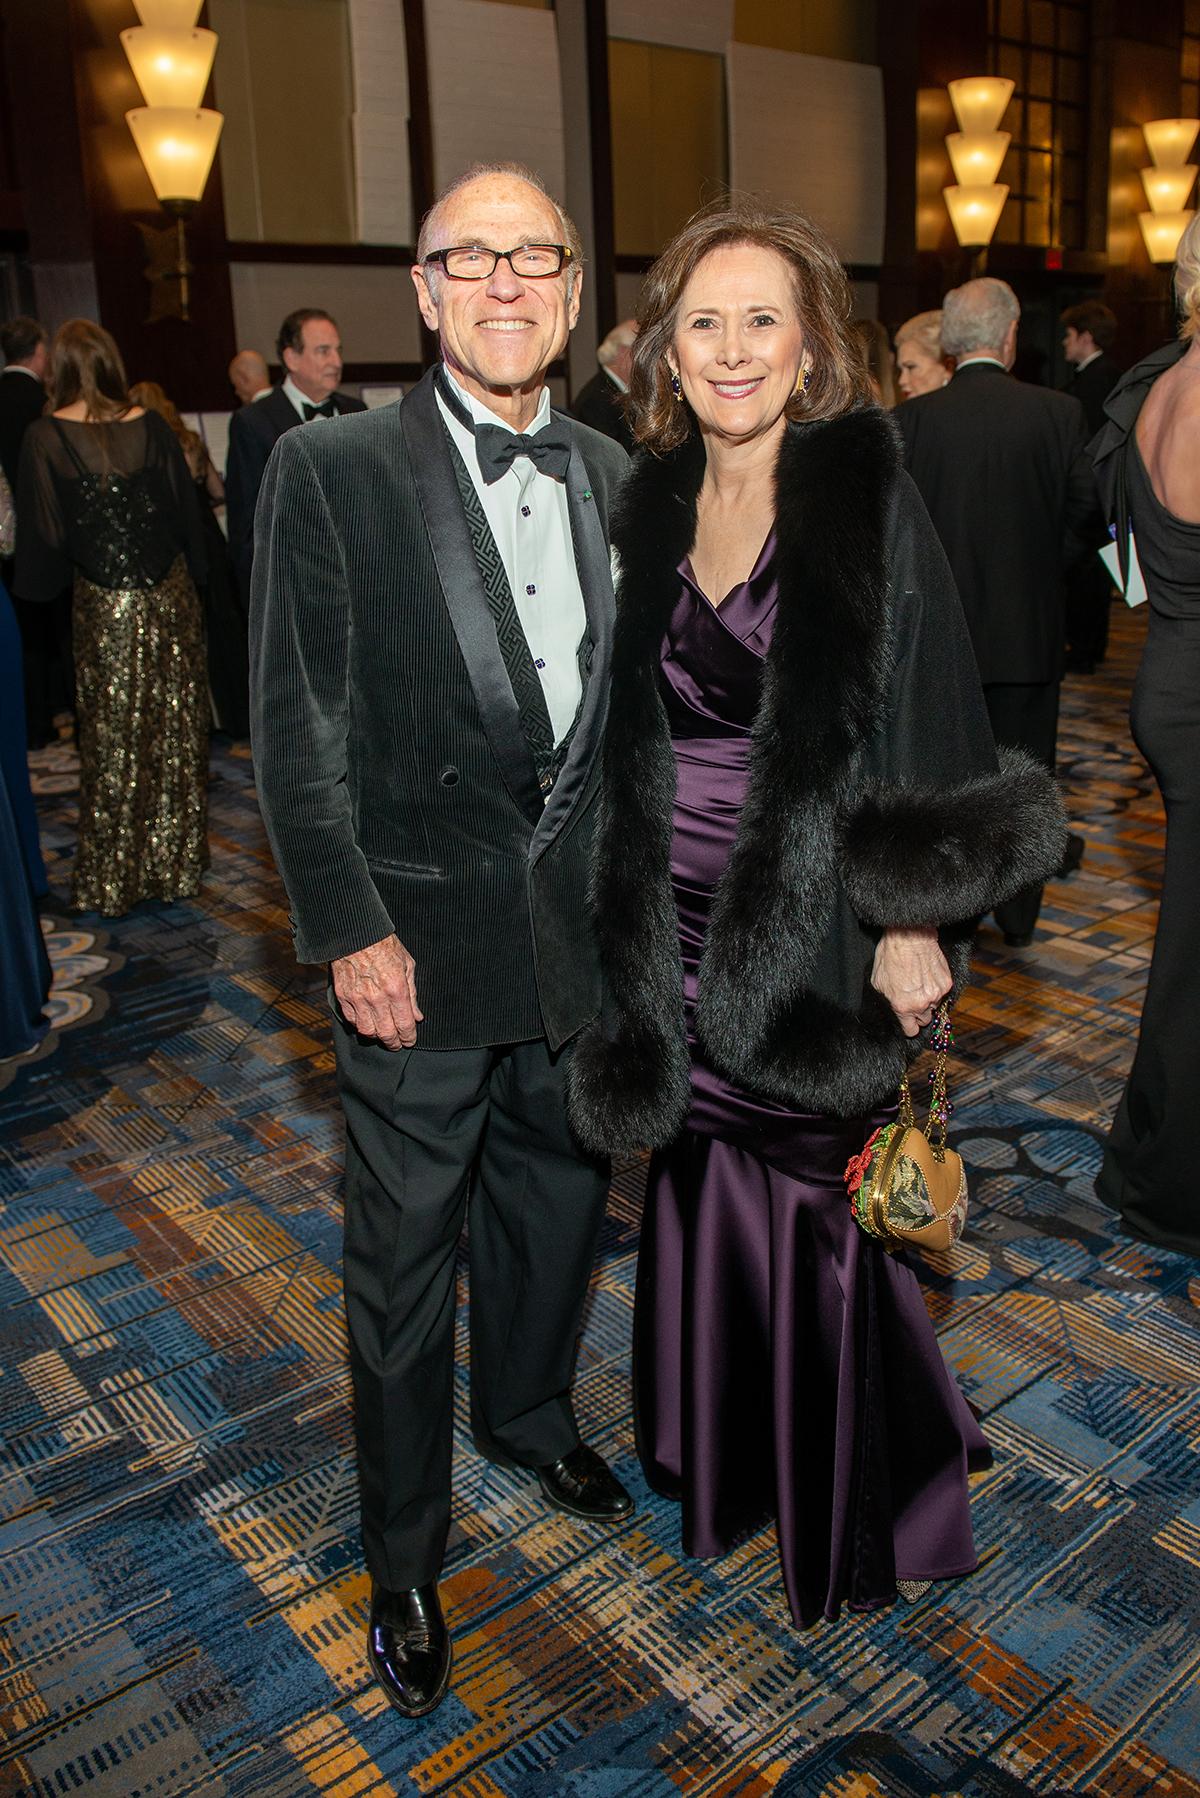 Robert Sakowitz and Franelle Rogers